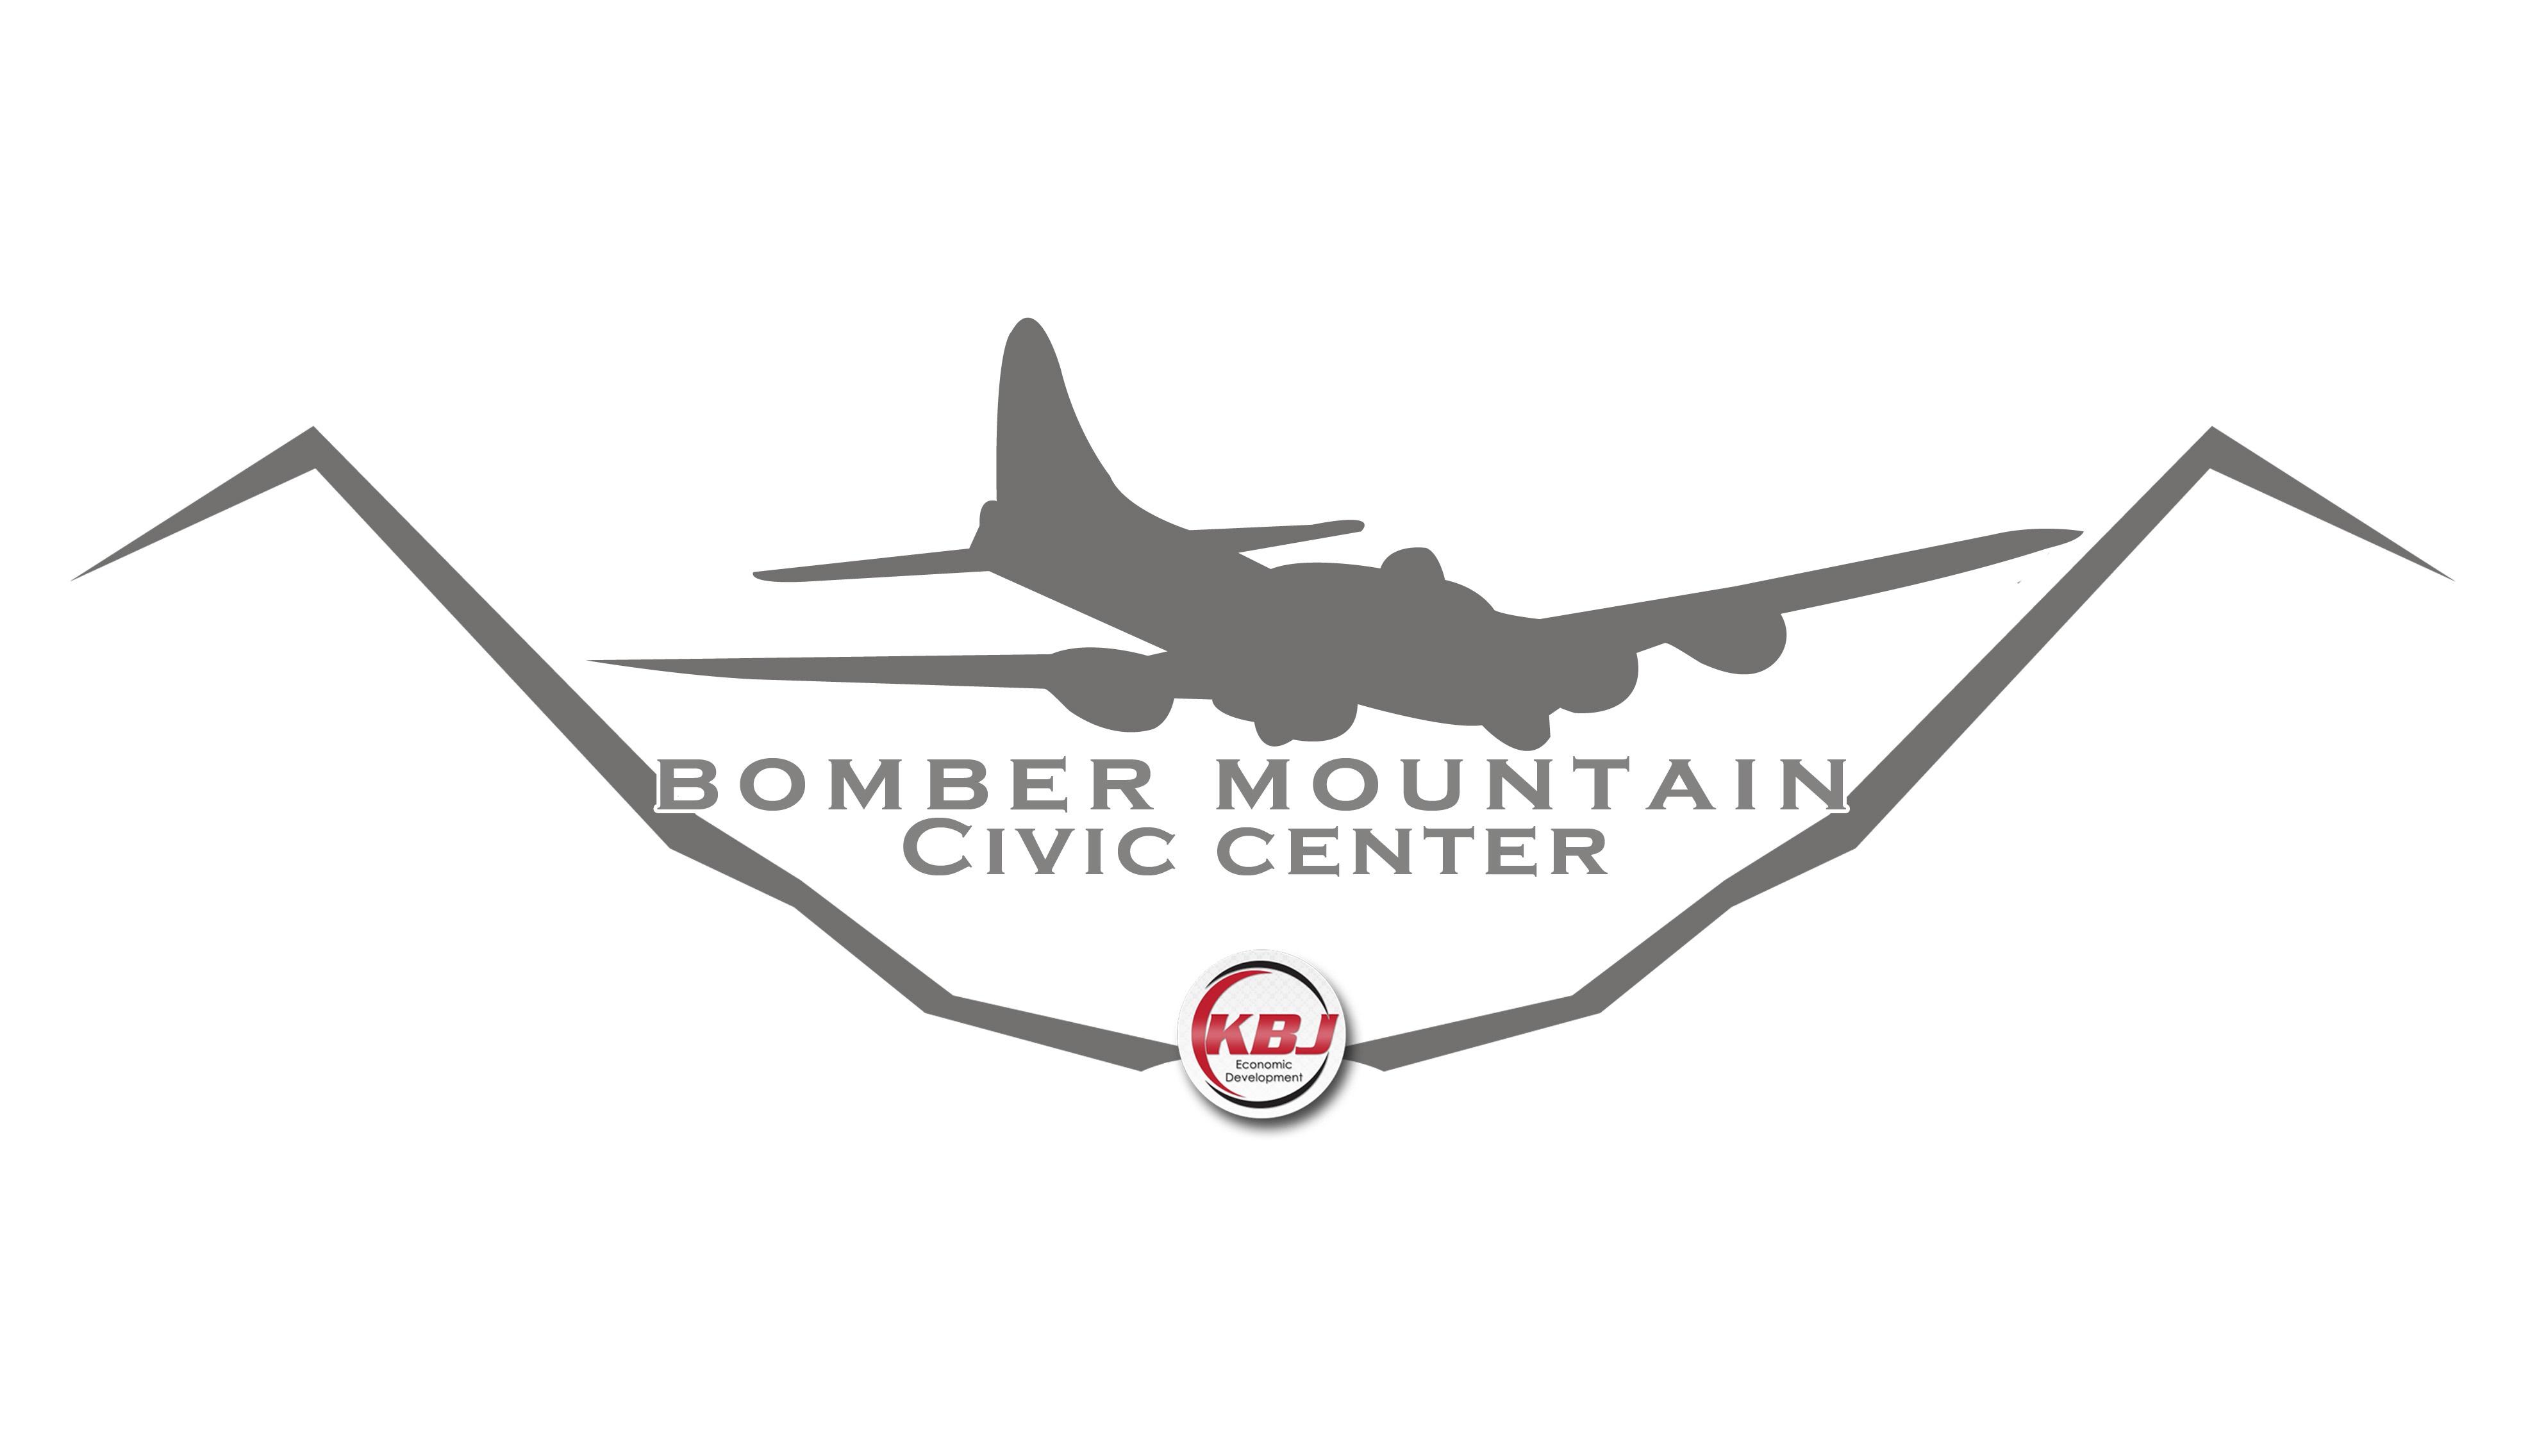 Bomber Mountain Civic Center